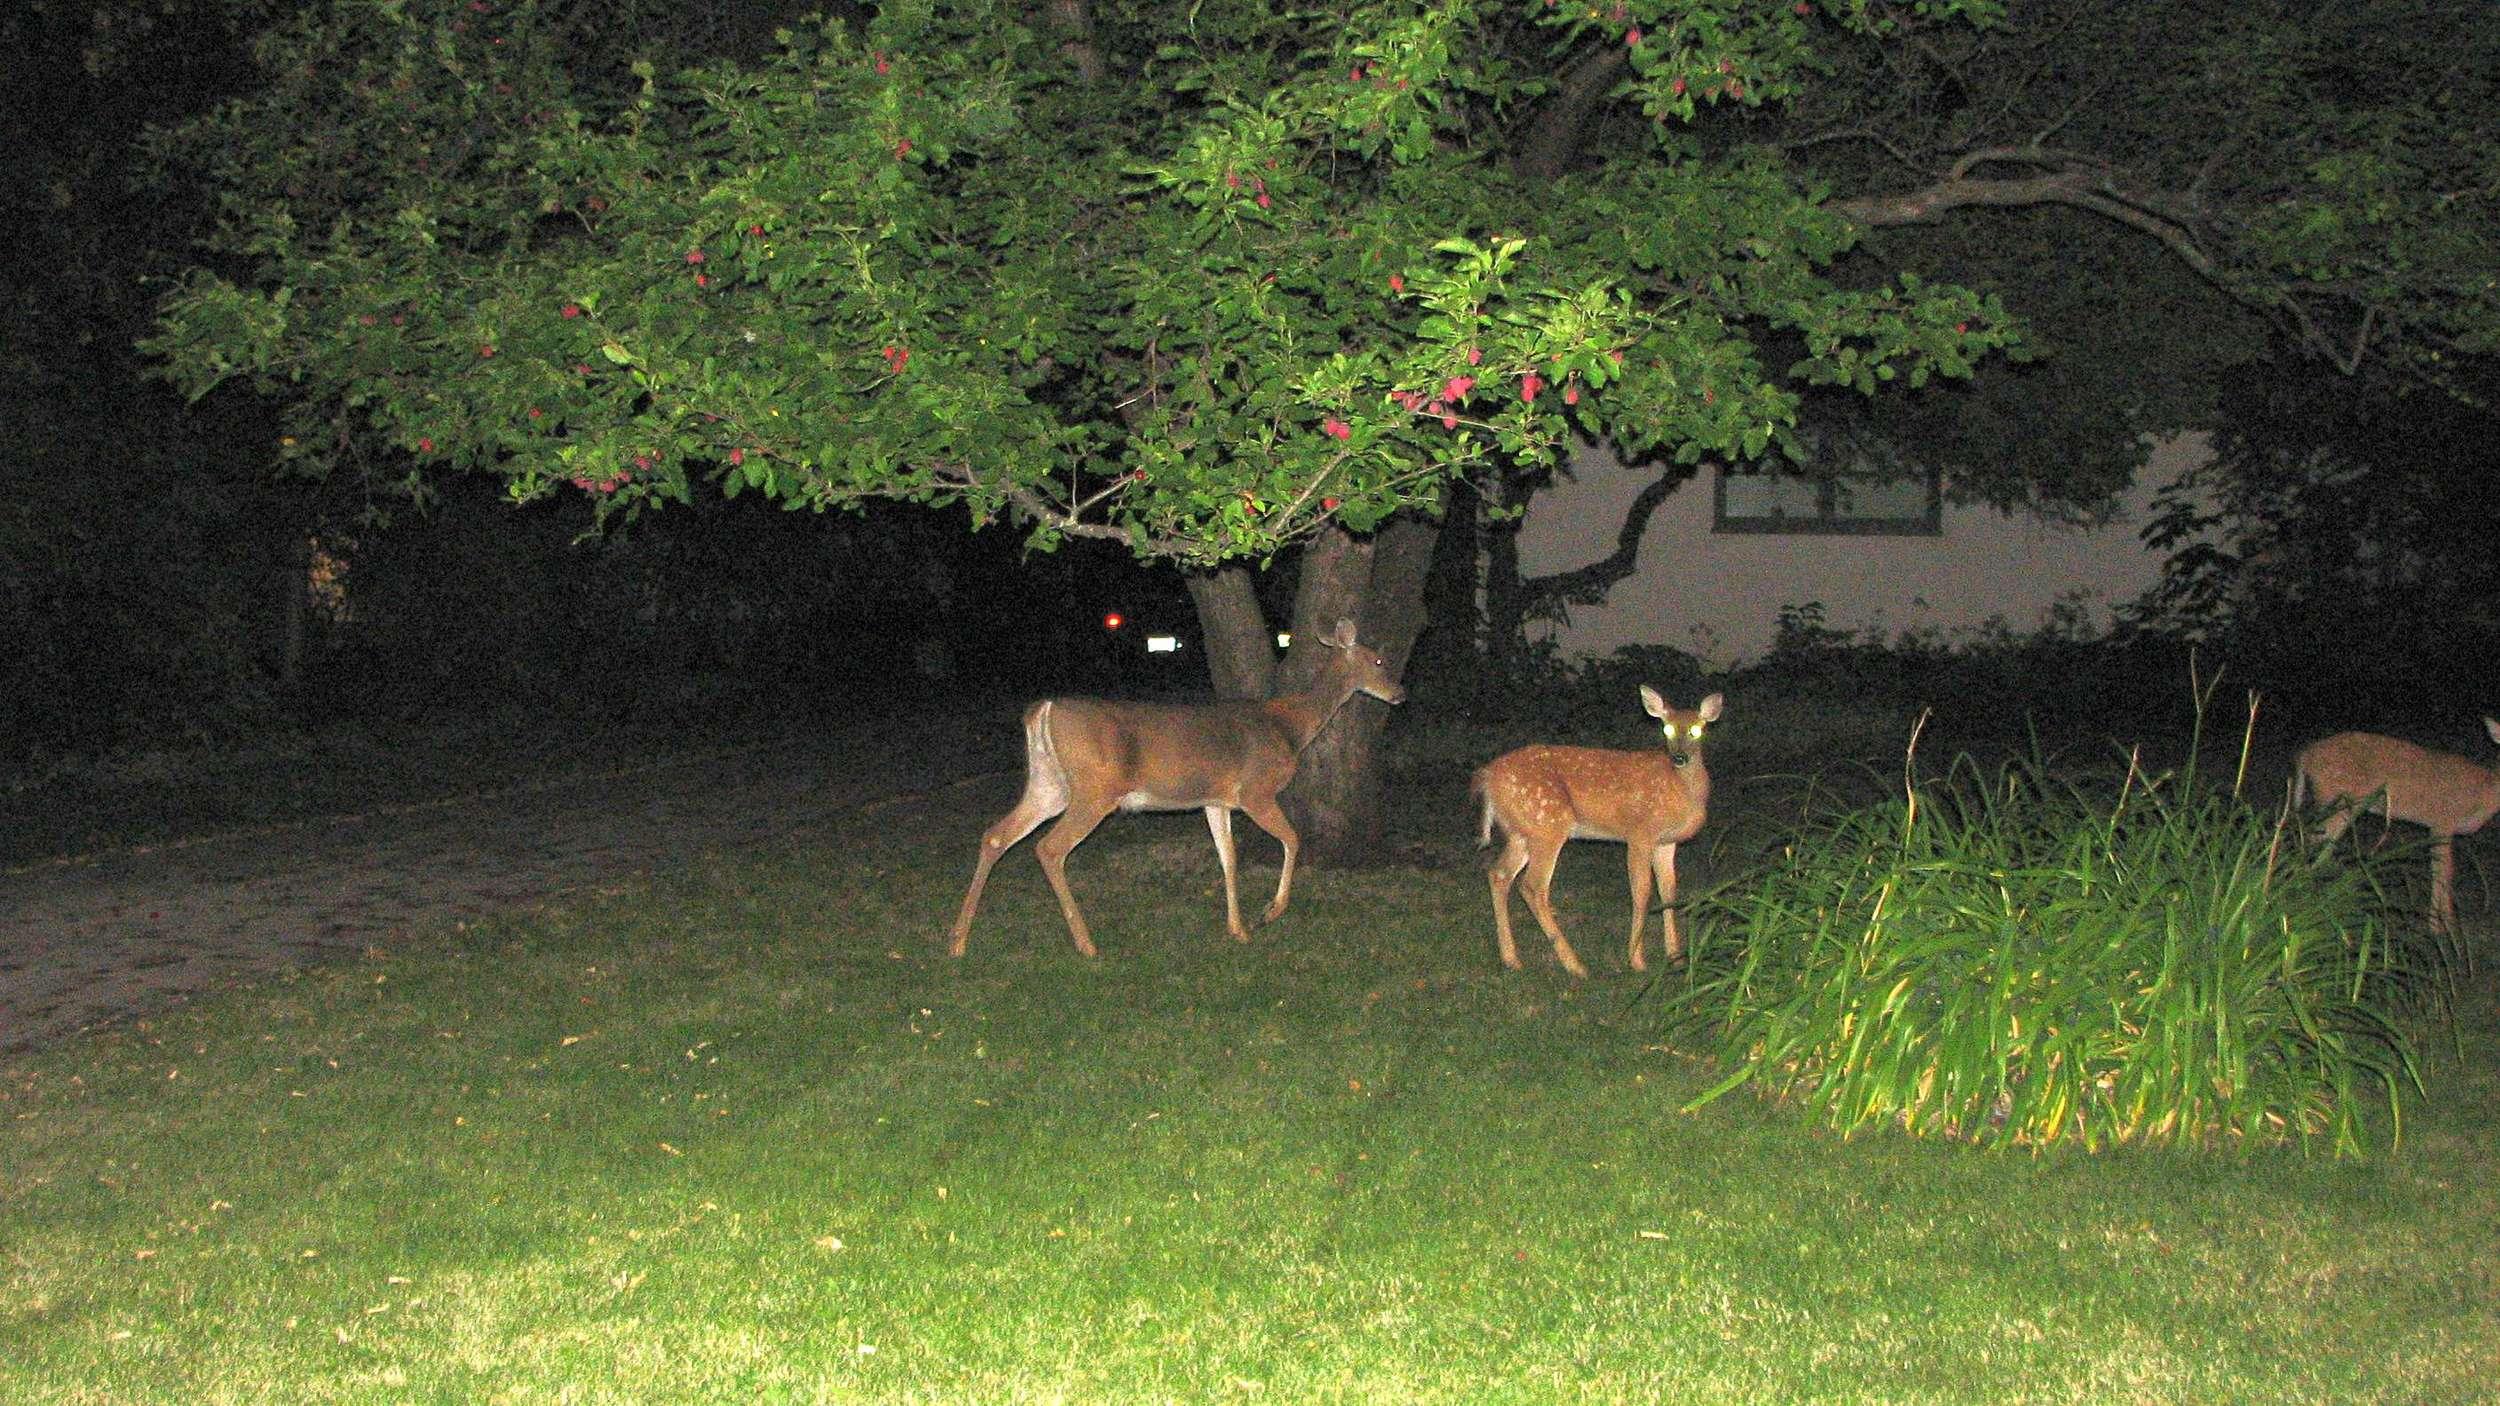 Deers in town, at Winnipeg (Manitoba)